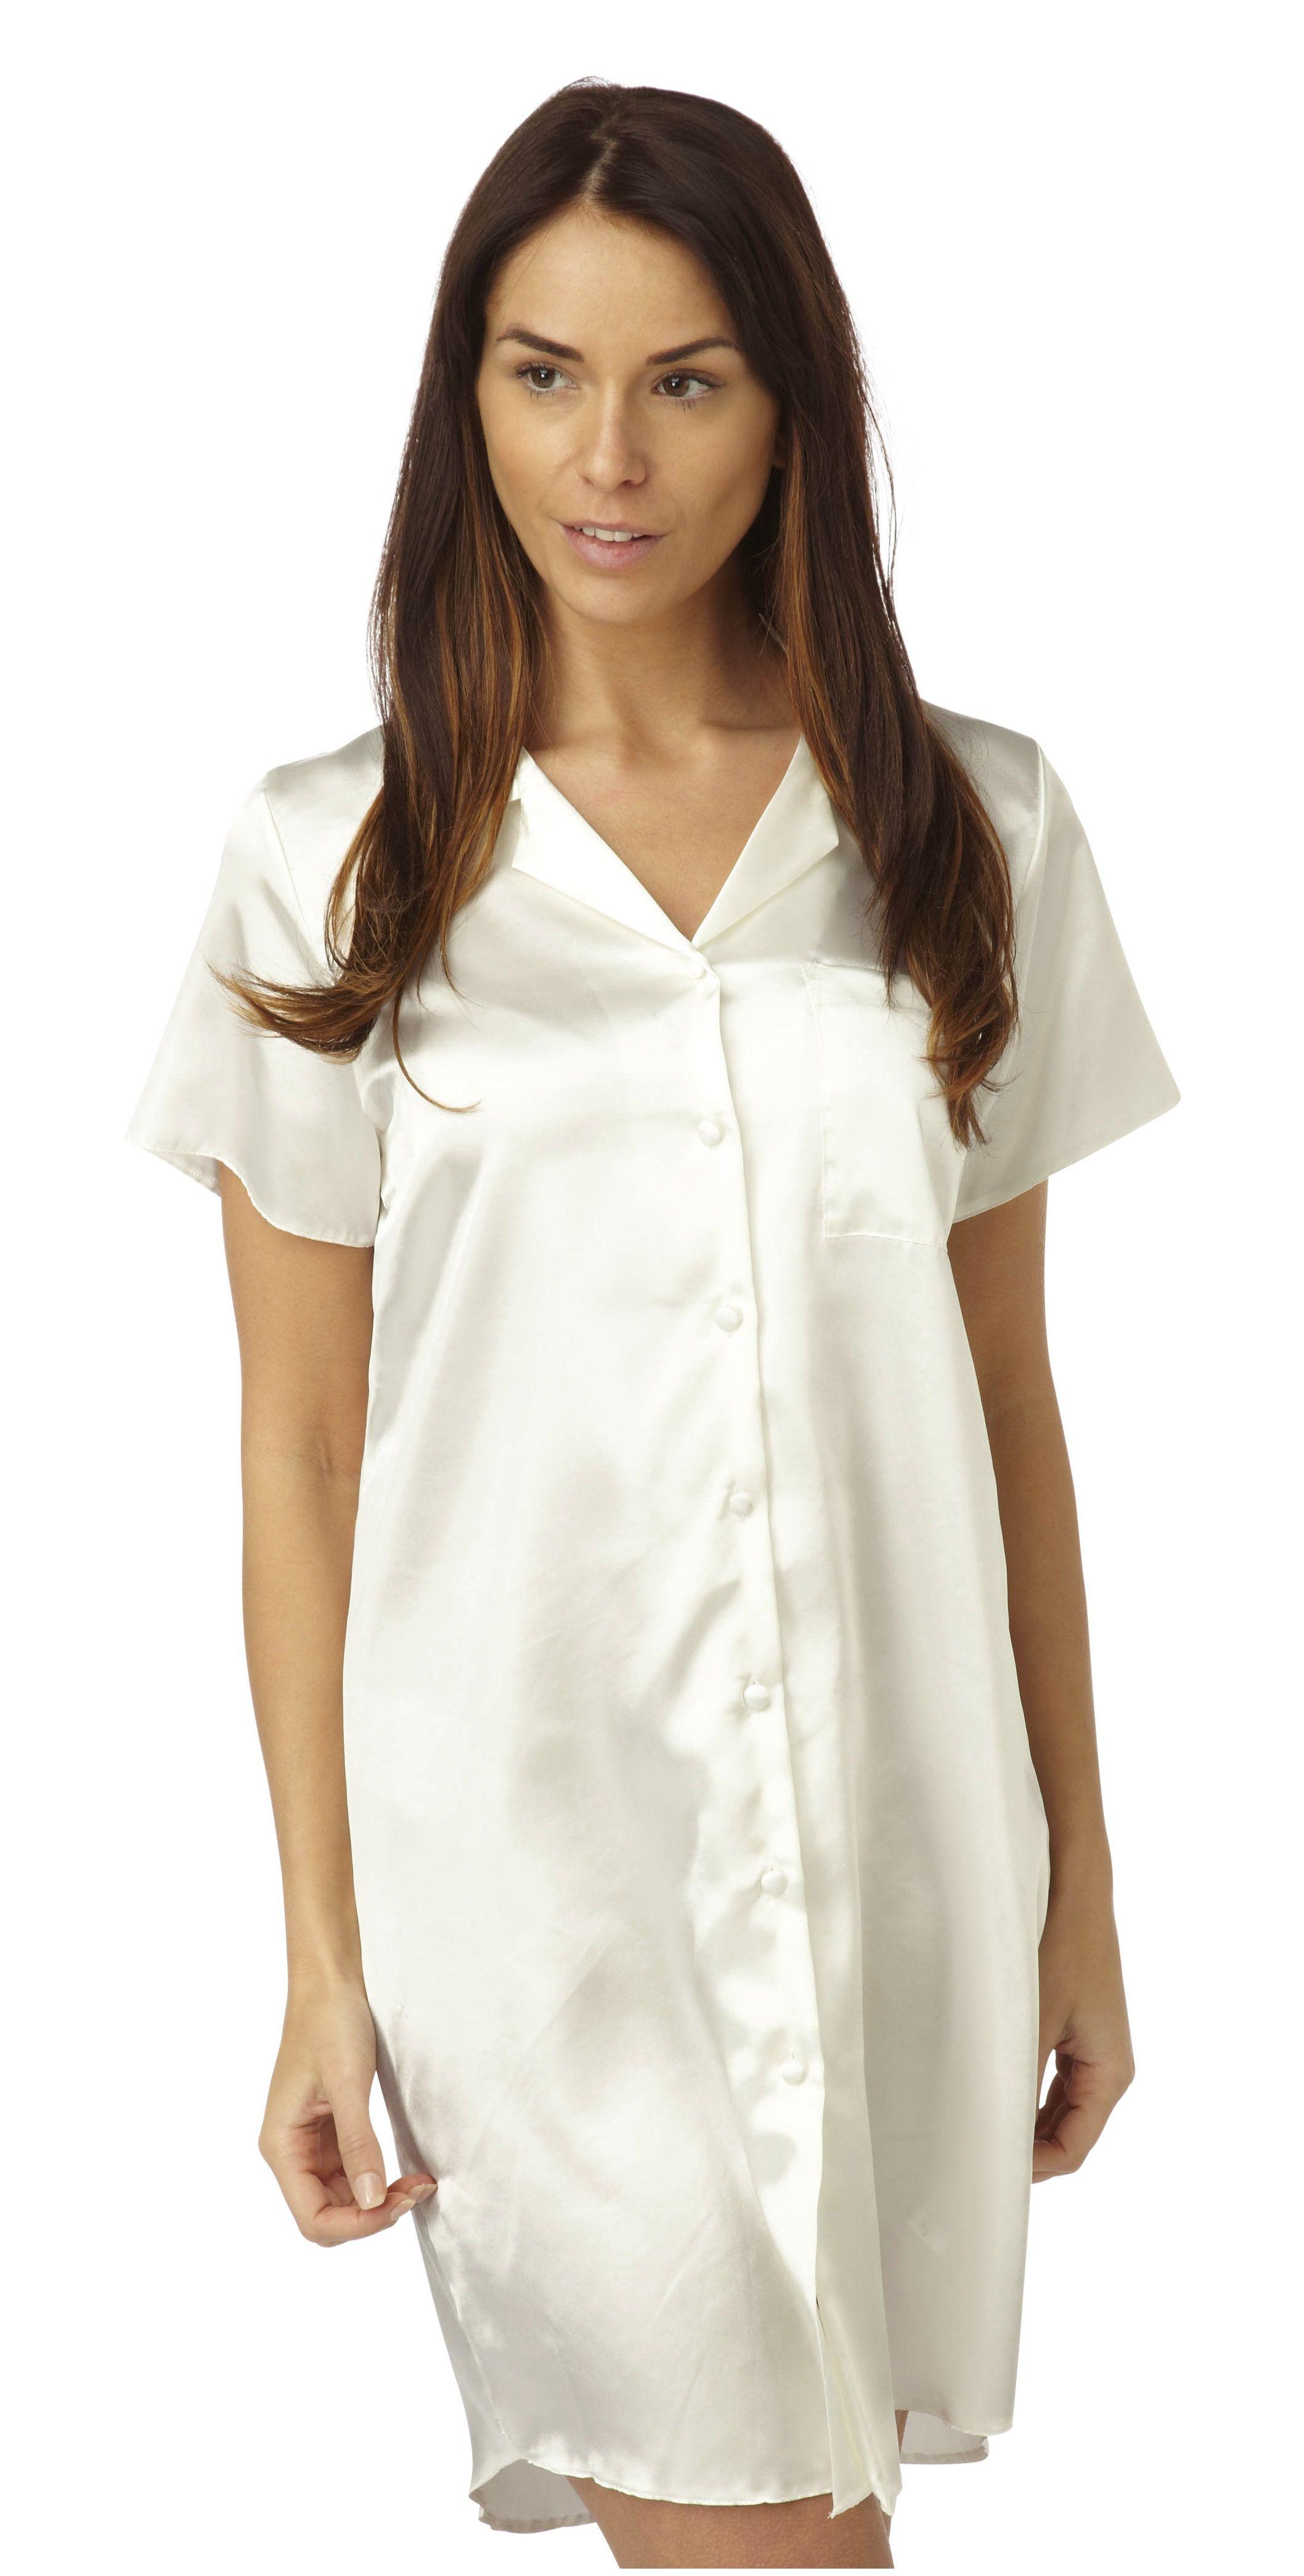 Ladies Satin 2 Piece Pyjamas Plain Ivory in Sizes 10//12-18//20